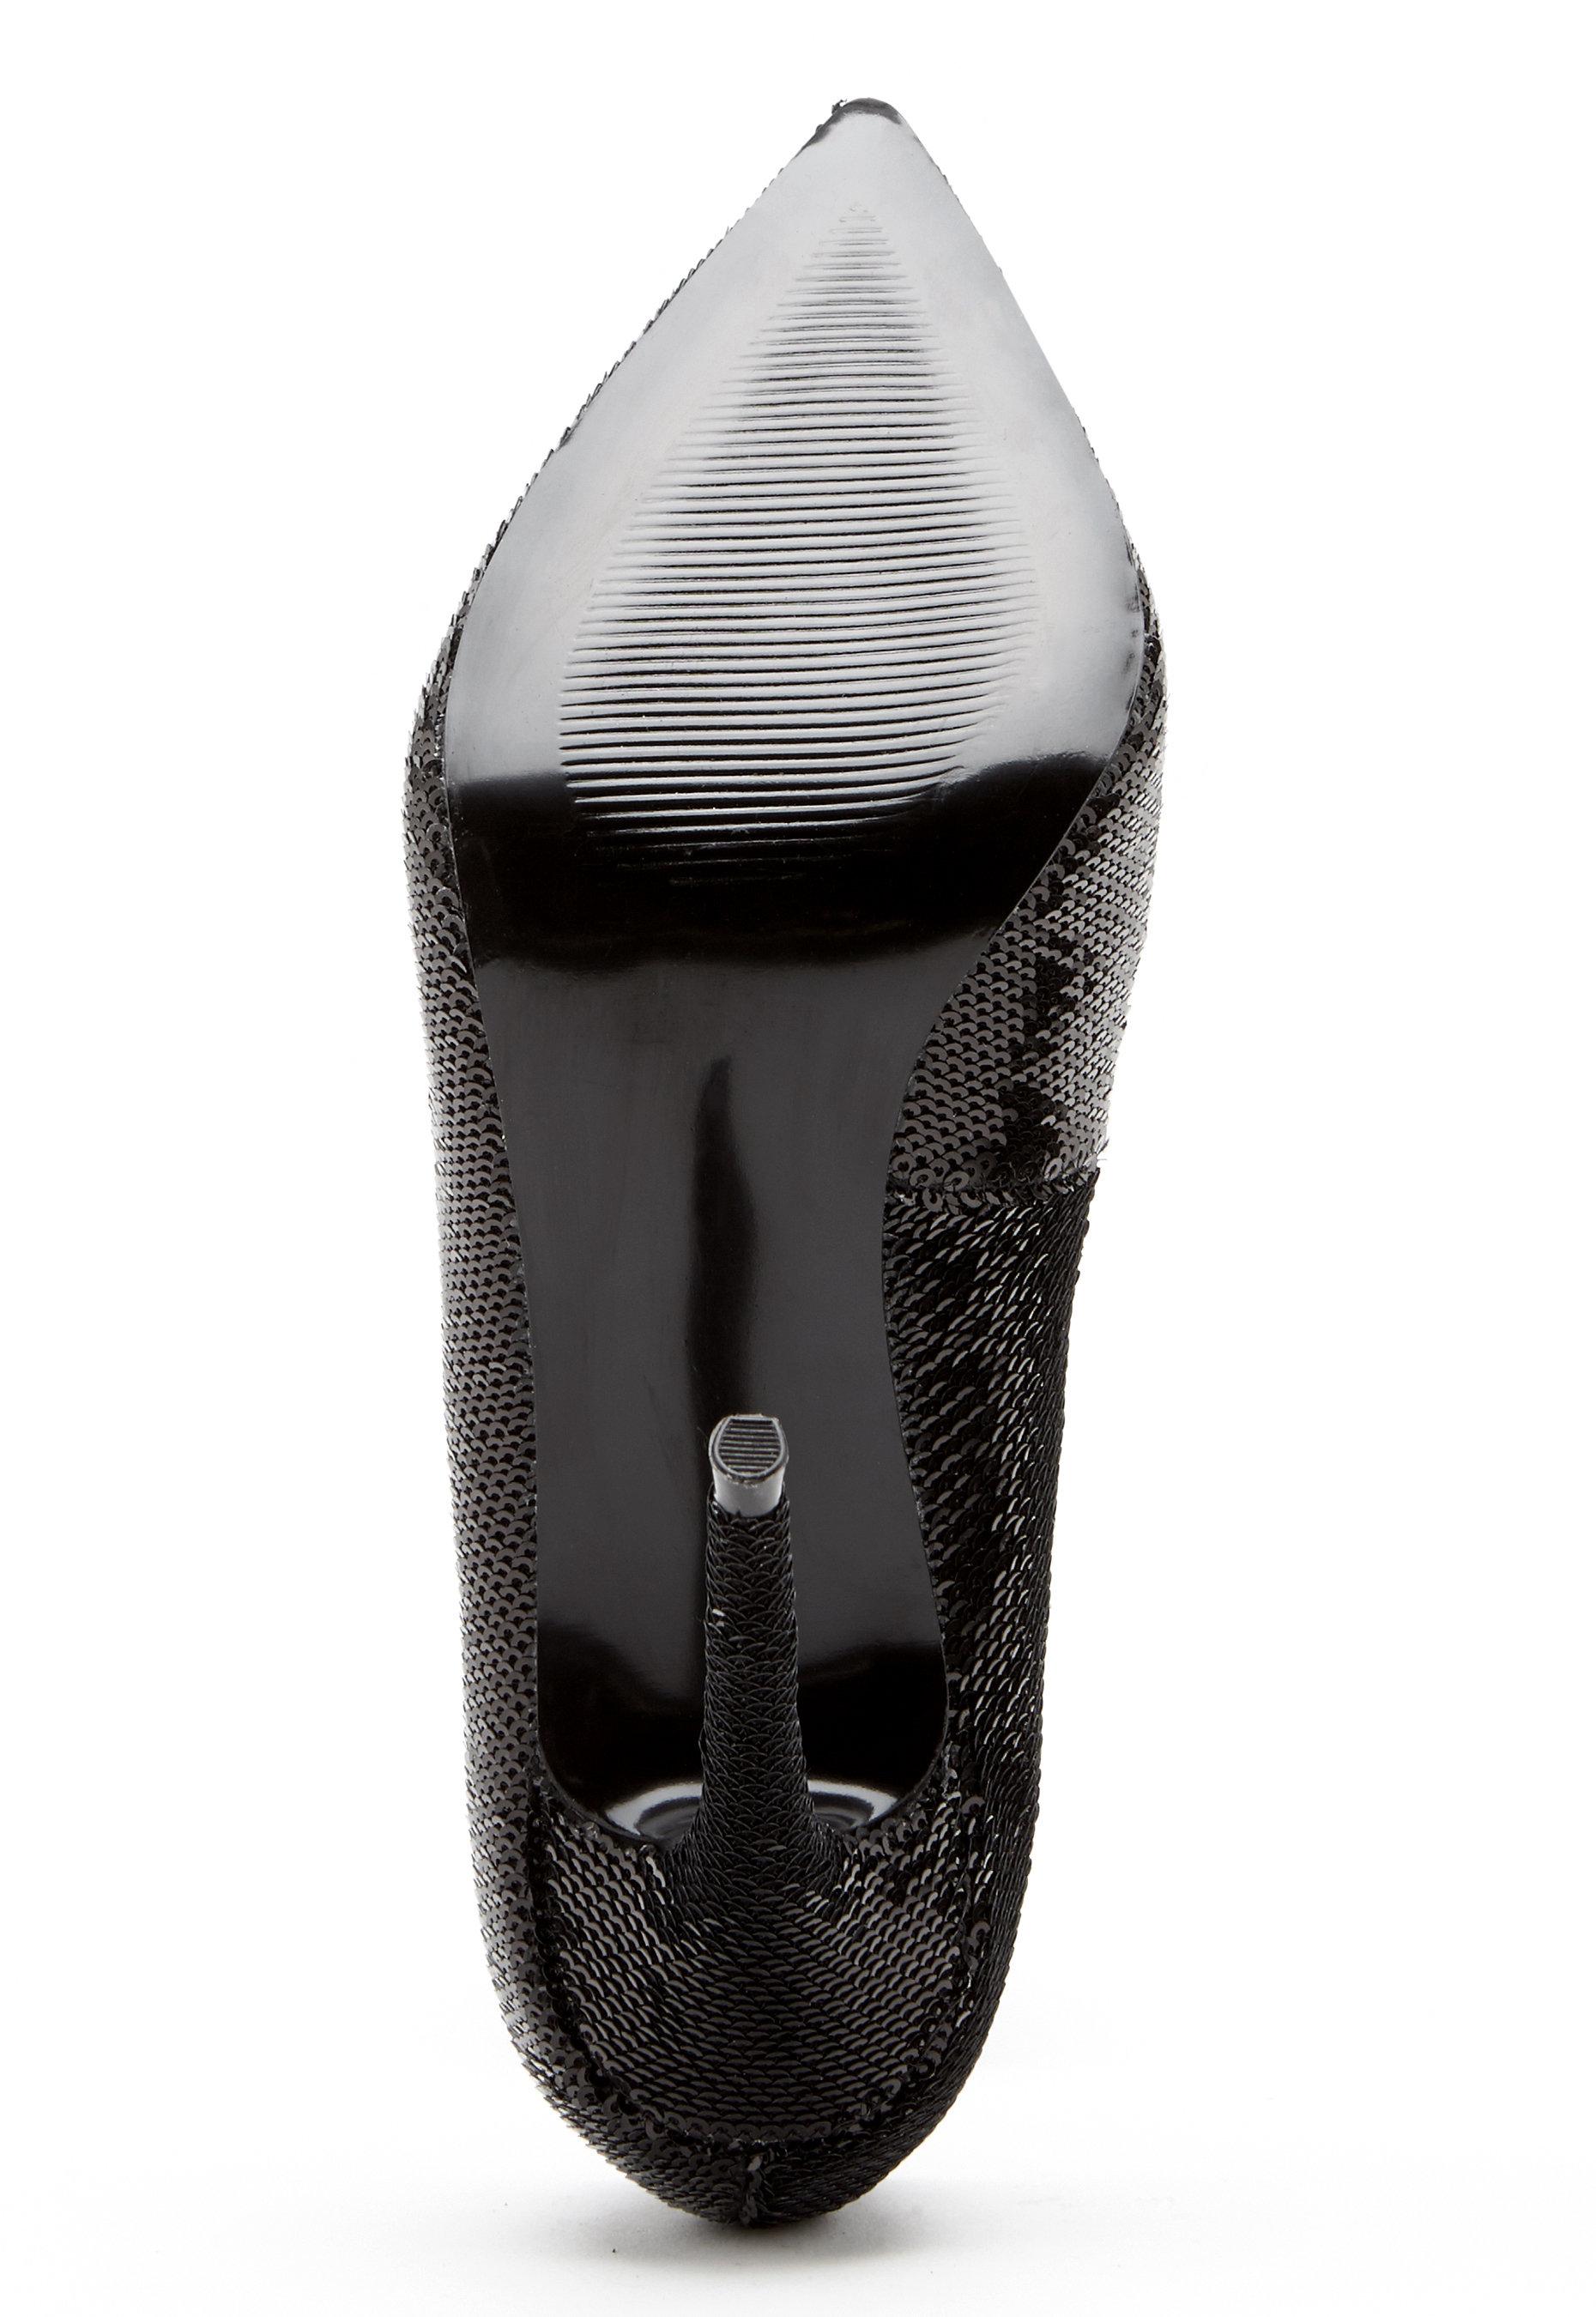 bd31c772896 Steve Madden Daisie Pump 174 Black Sequins - Bubbleroom